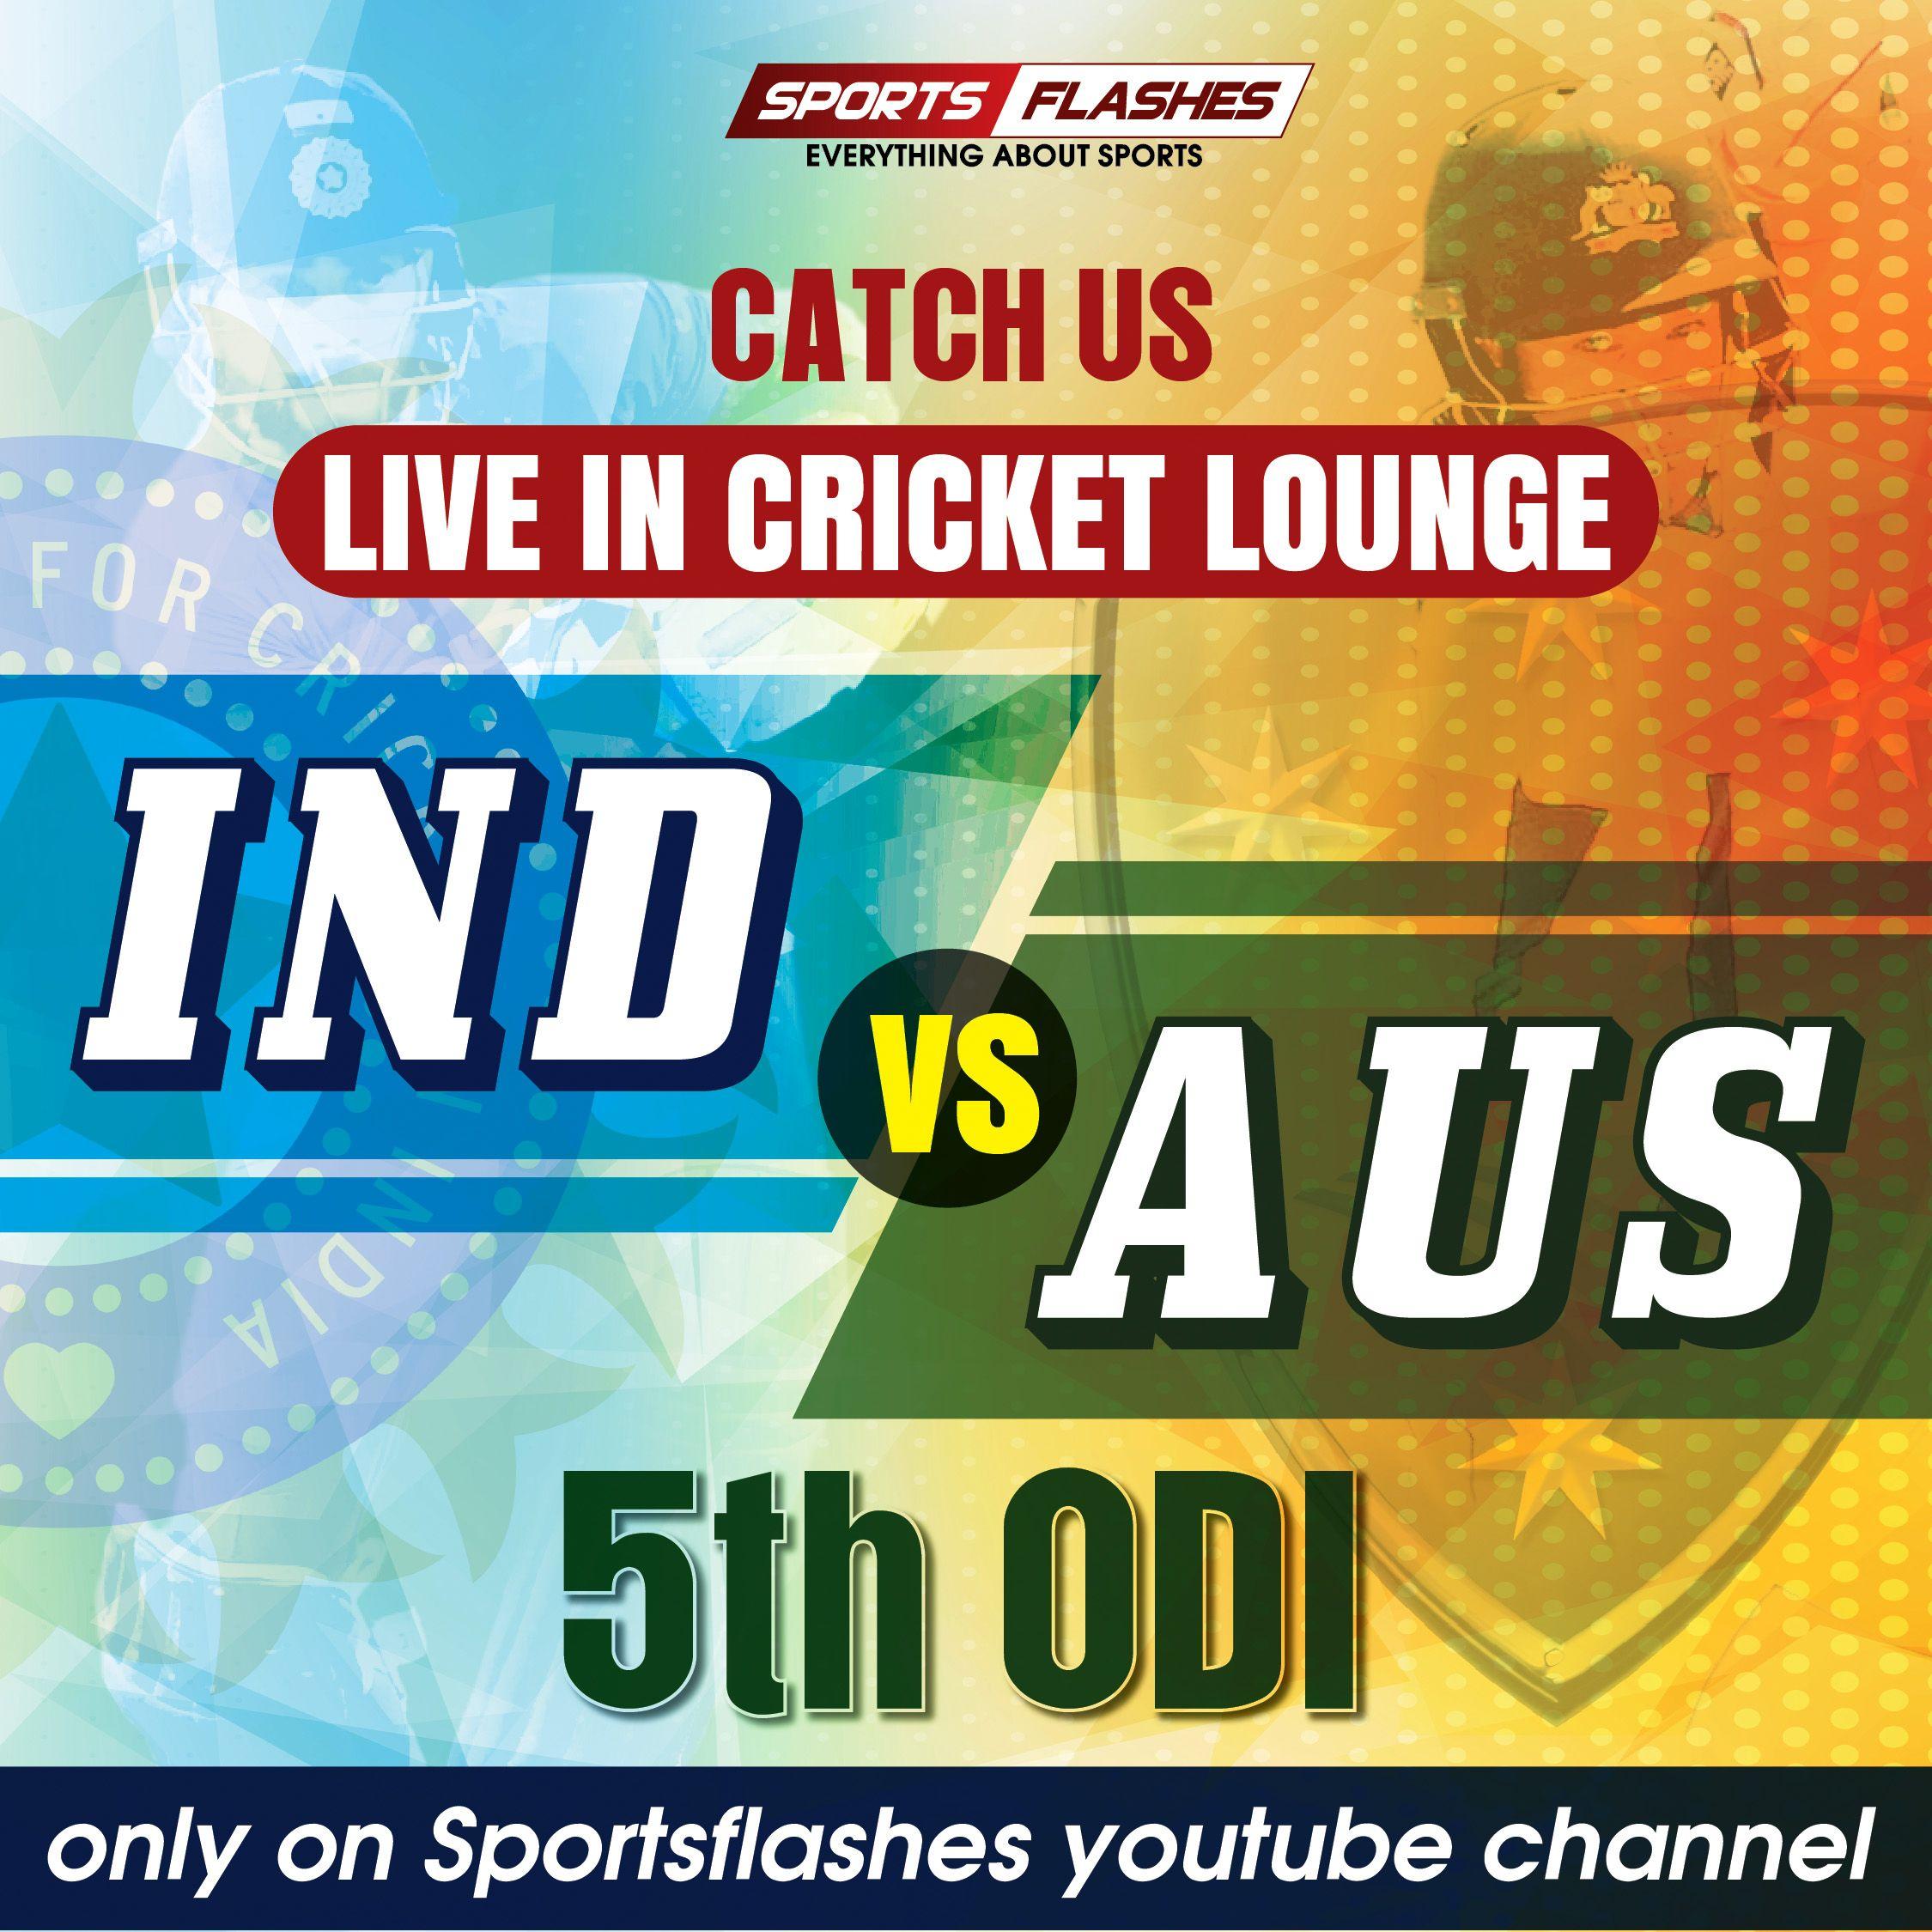 Catch Us Live In Ind Vs Aus 5thodi Only On Youtube Sportsflashes Indvaus Sheffieldshield Teamindia 5thodi D Sport Radio Hockey World Cup Radio Channels